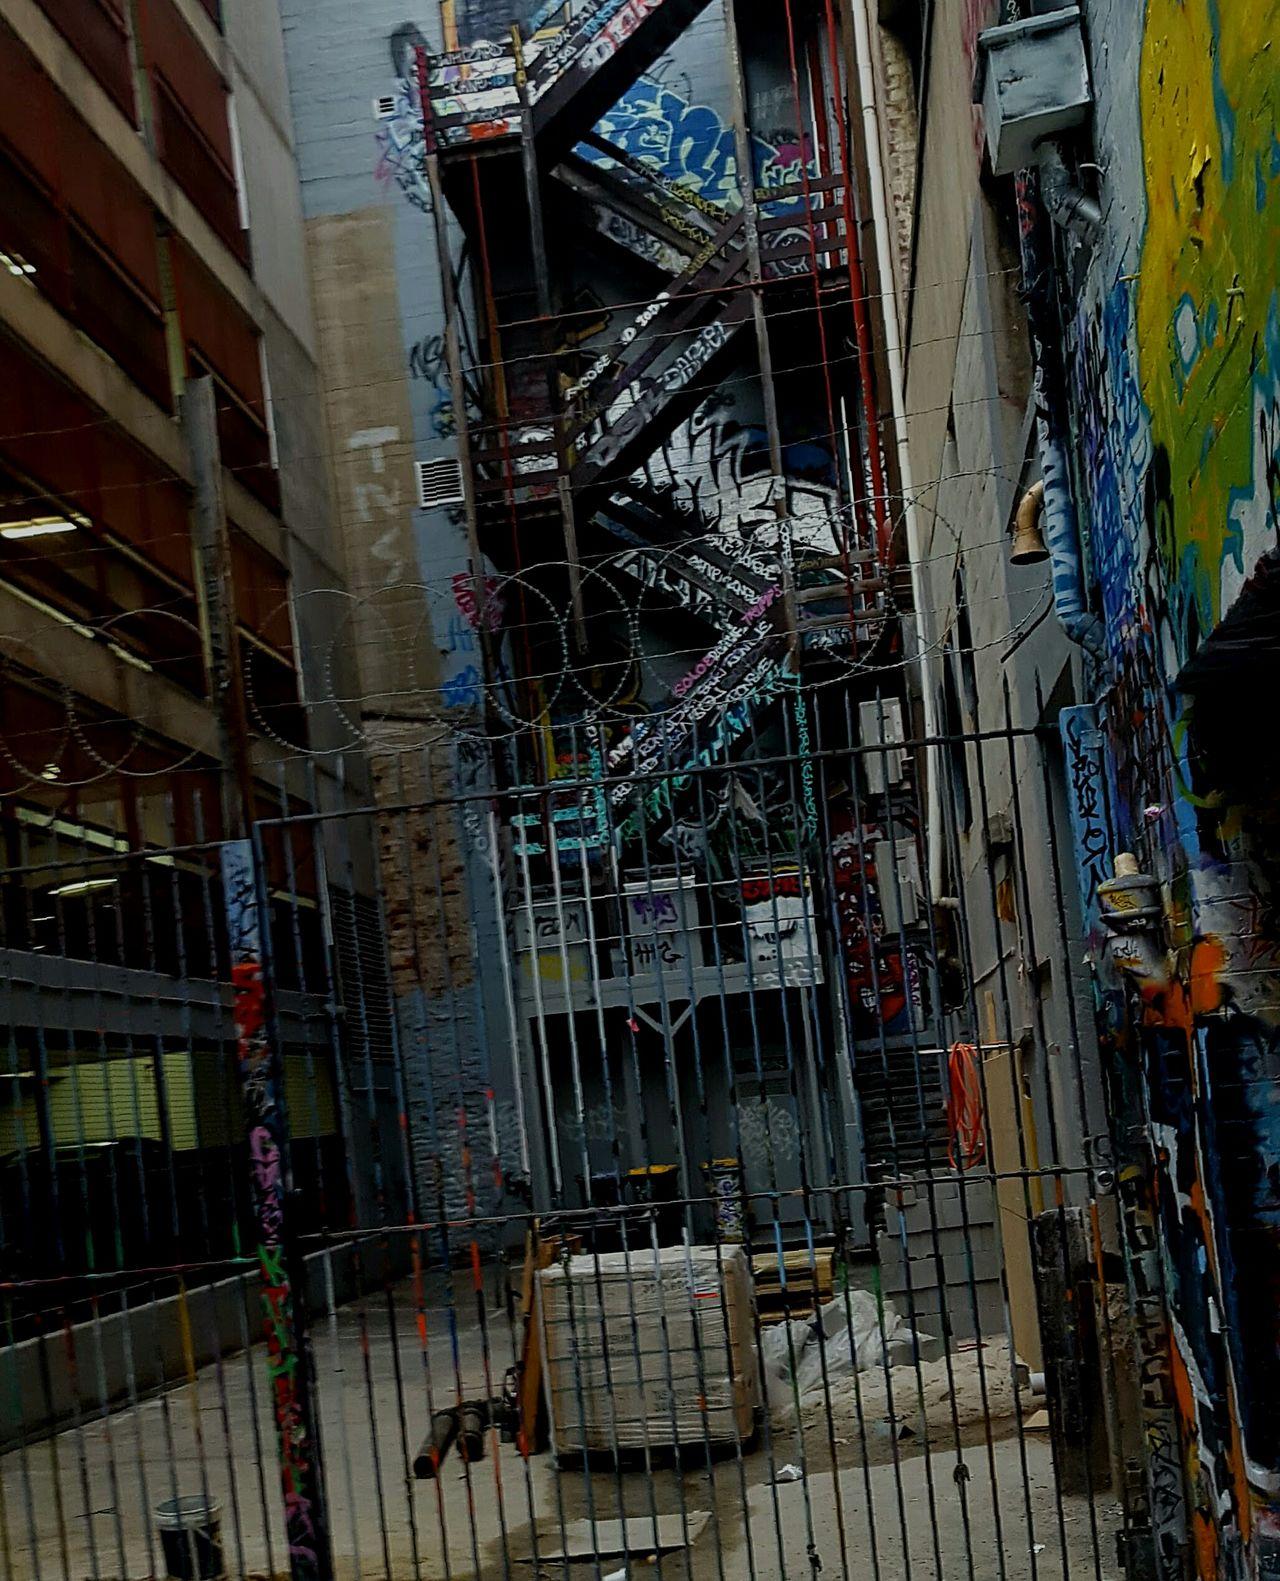 Street art Street Art Building Stsirway Laneway Melbourne Graffiti